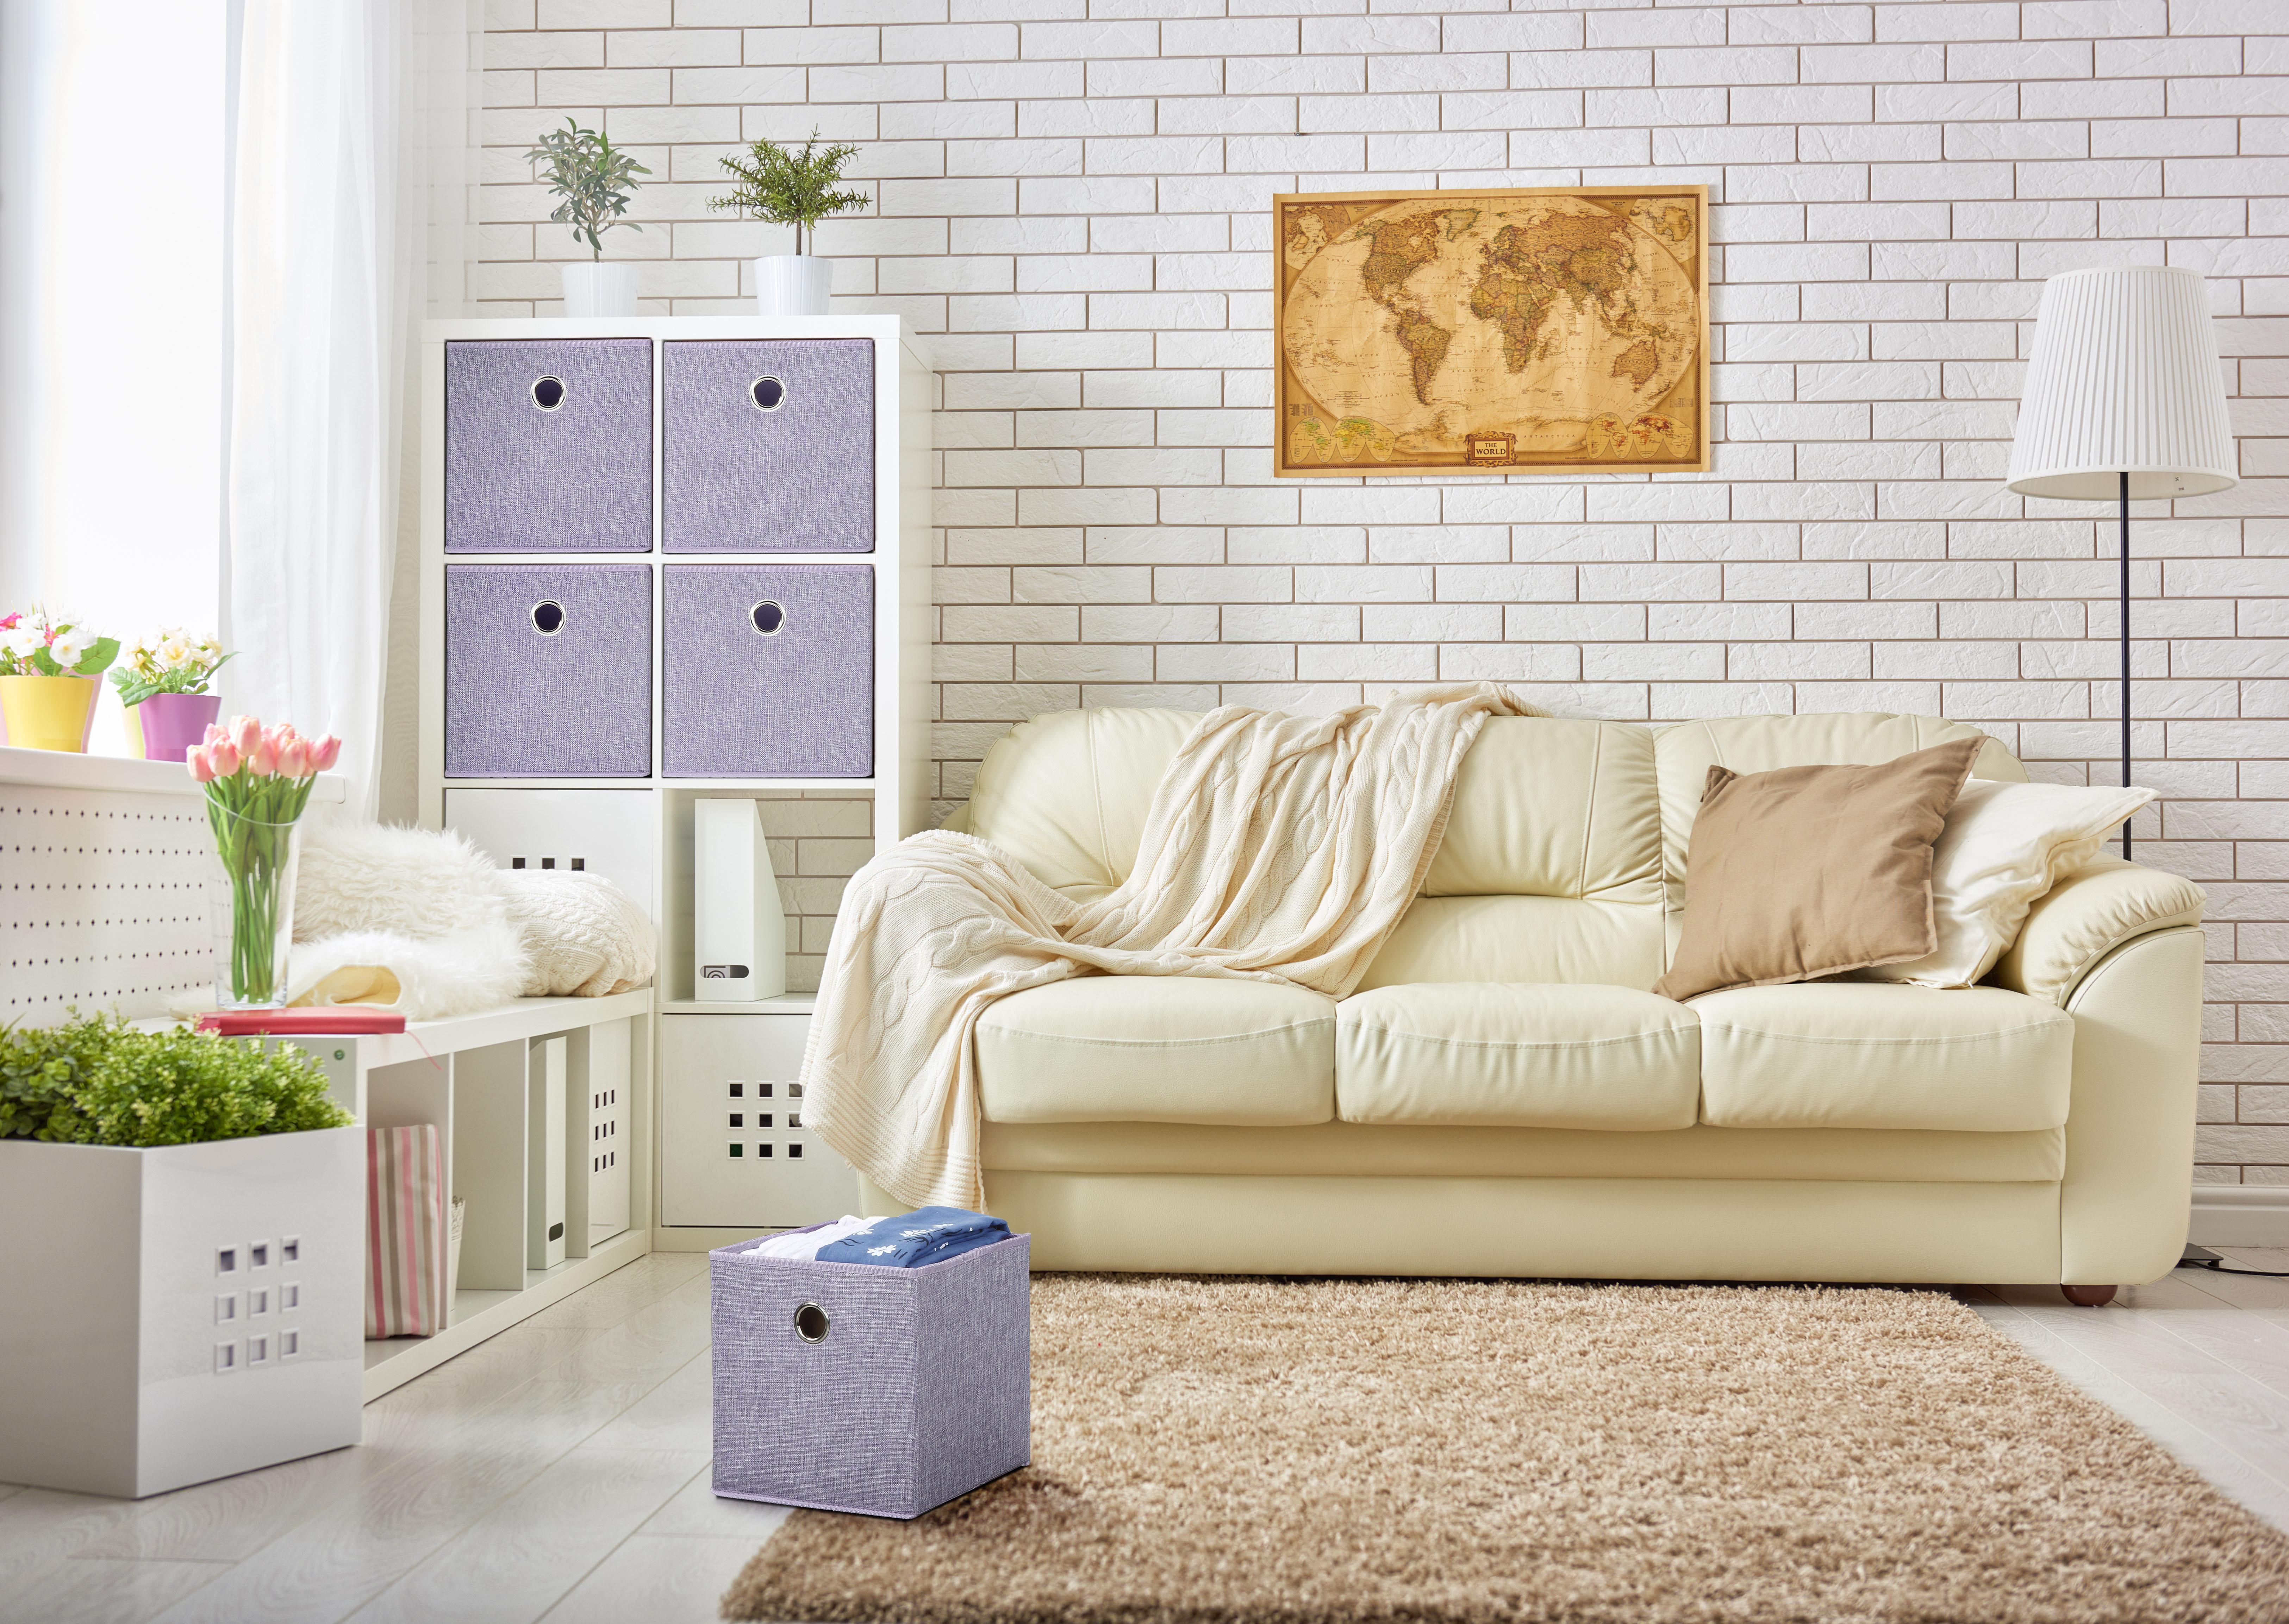 #601 lilac lifestyle